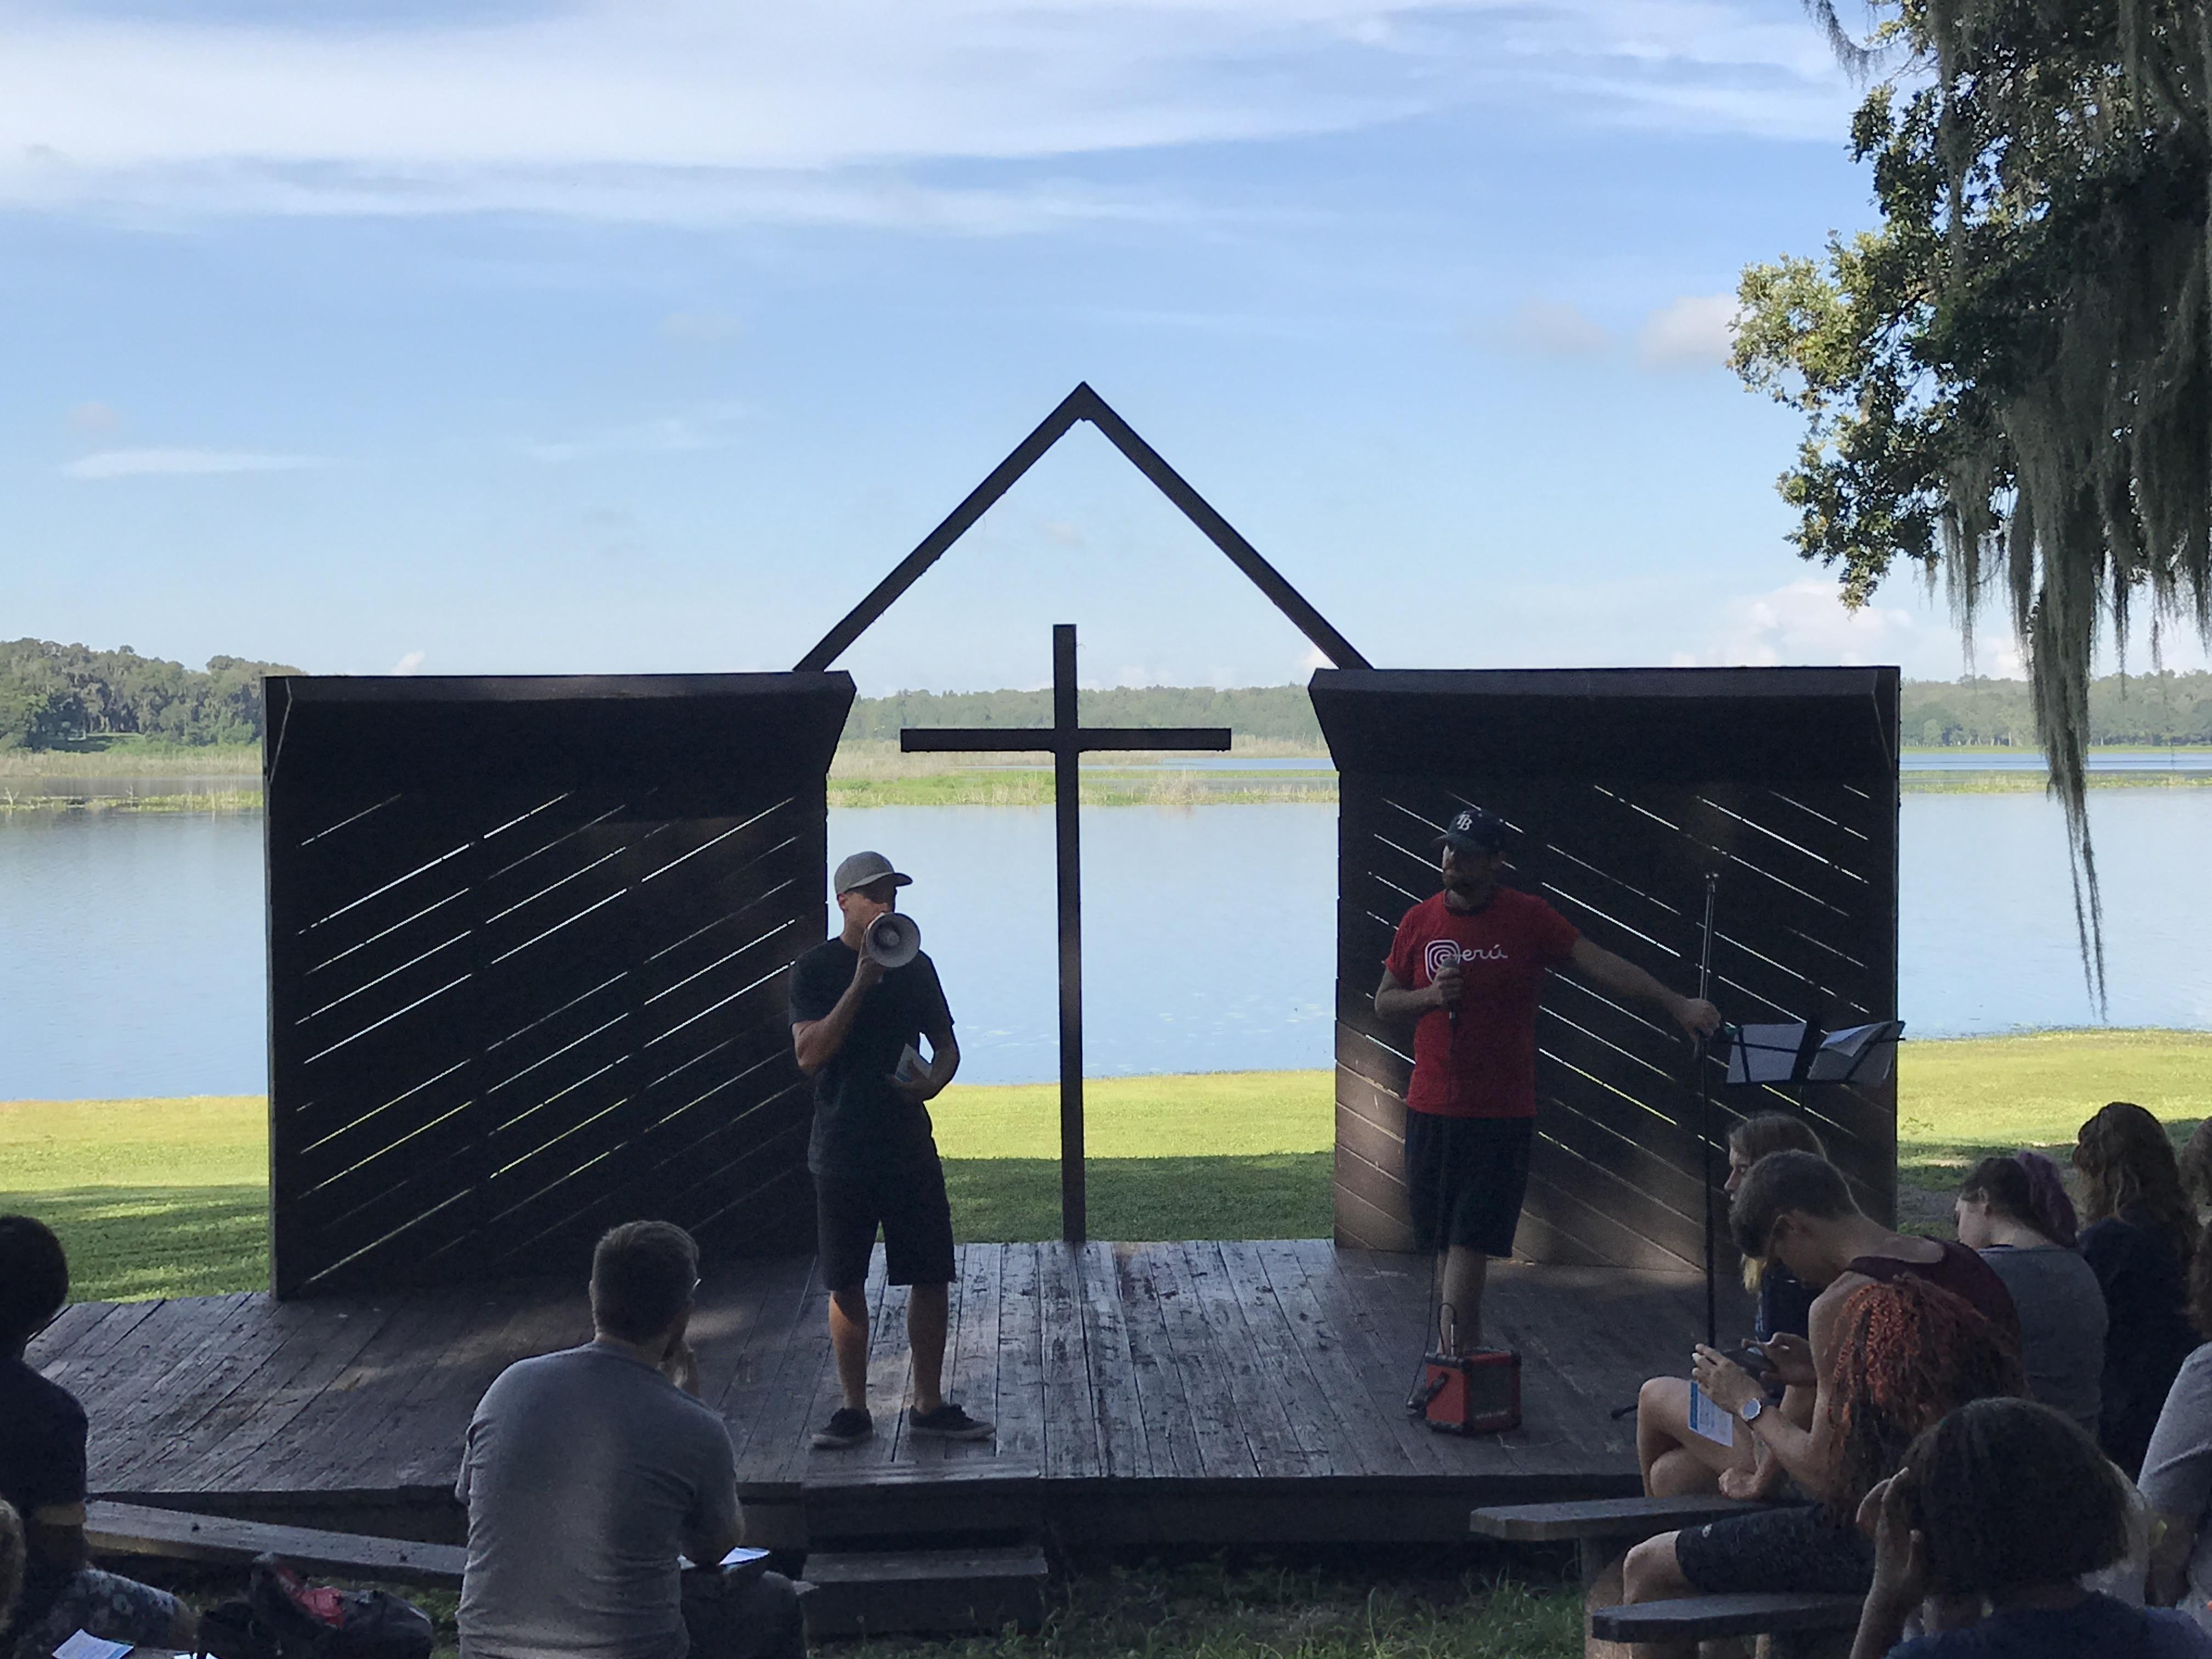 2017-07-21 09.55.13